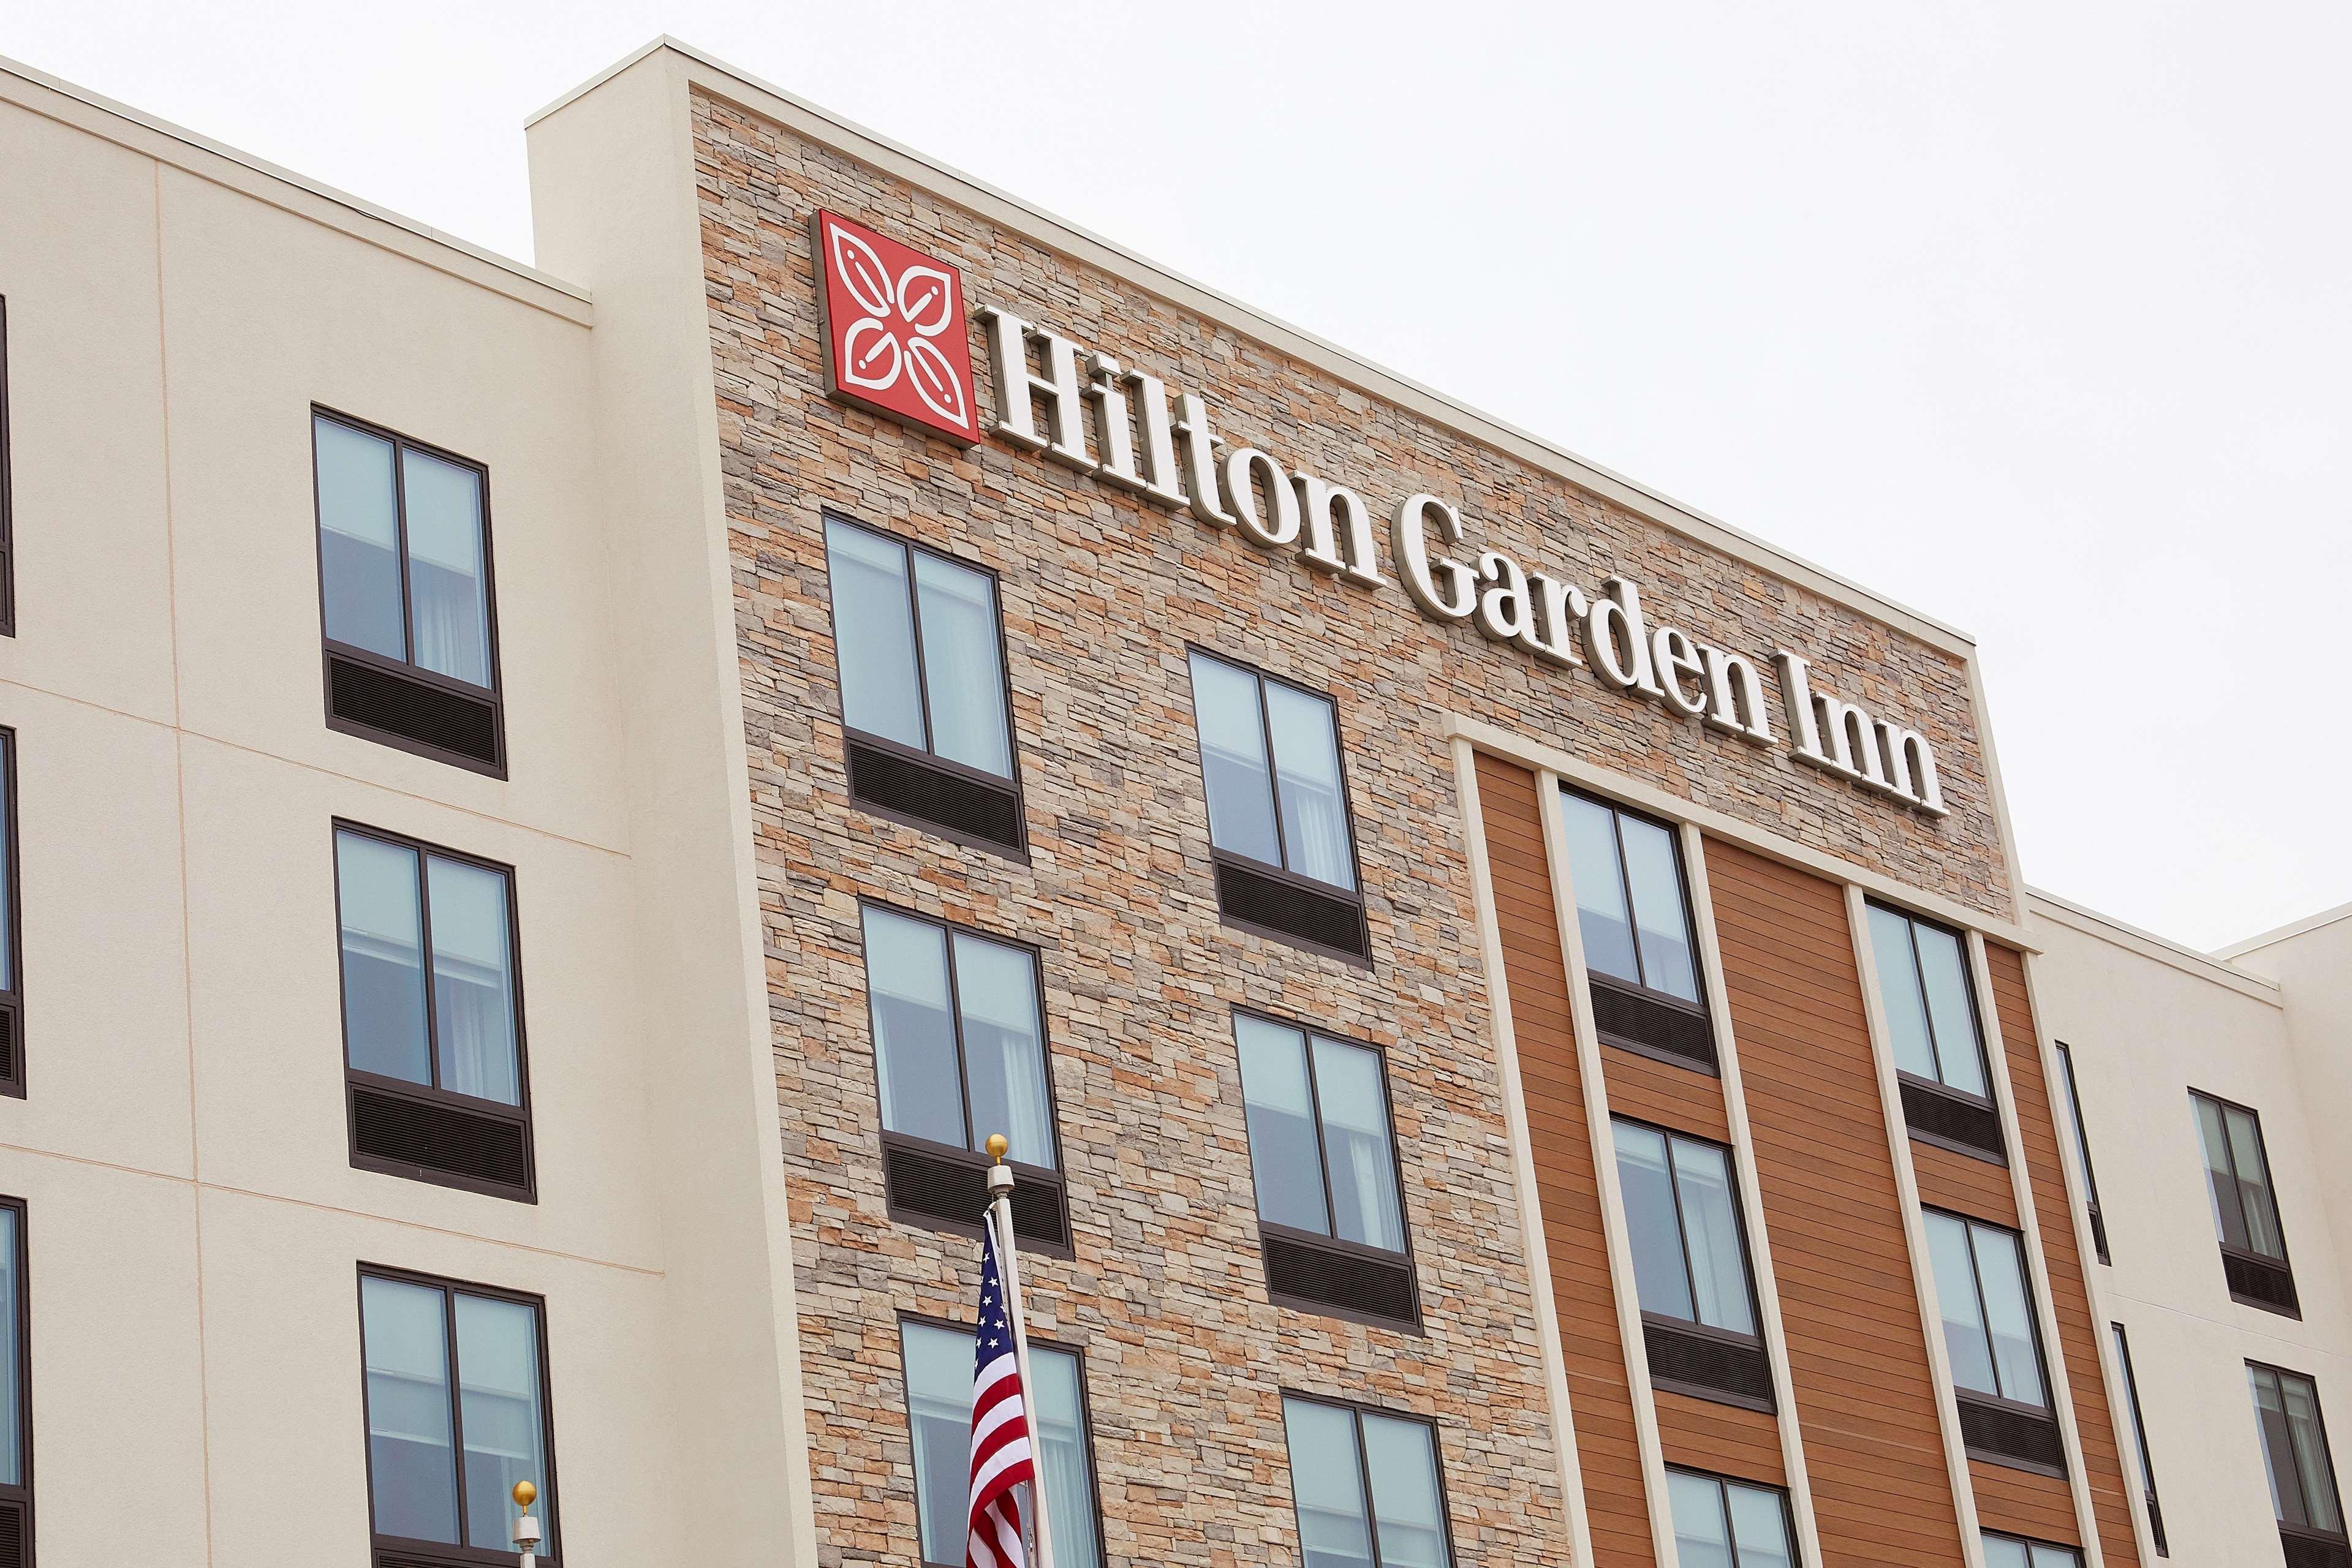 Hilton Garden Inn Elizabethtown image 1